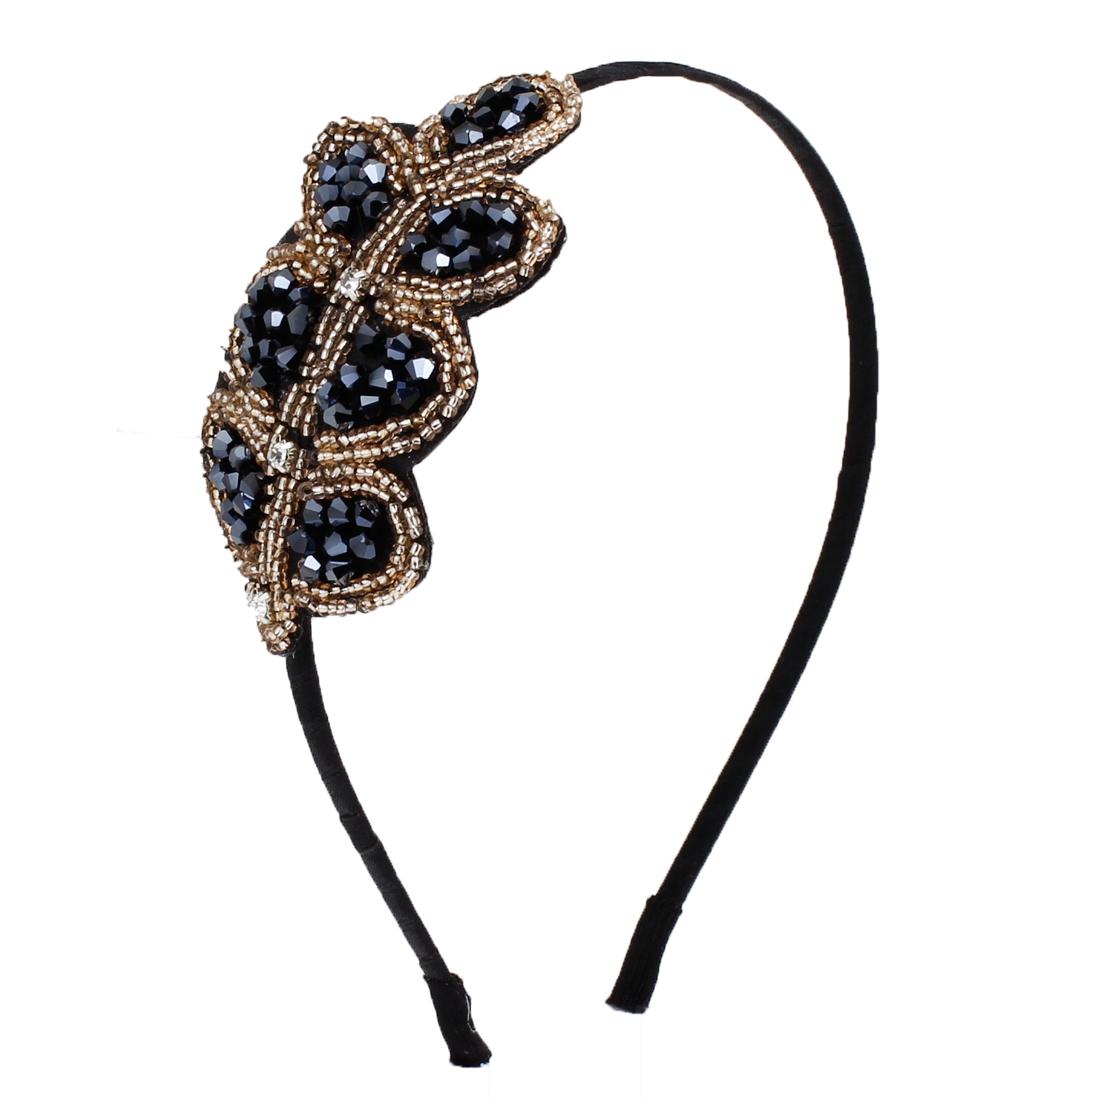 Women Blue Silver Tone Plastic Beads Decor Leaf Shaped Ornament Headband Hair Hoop